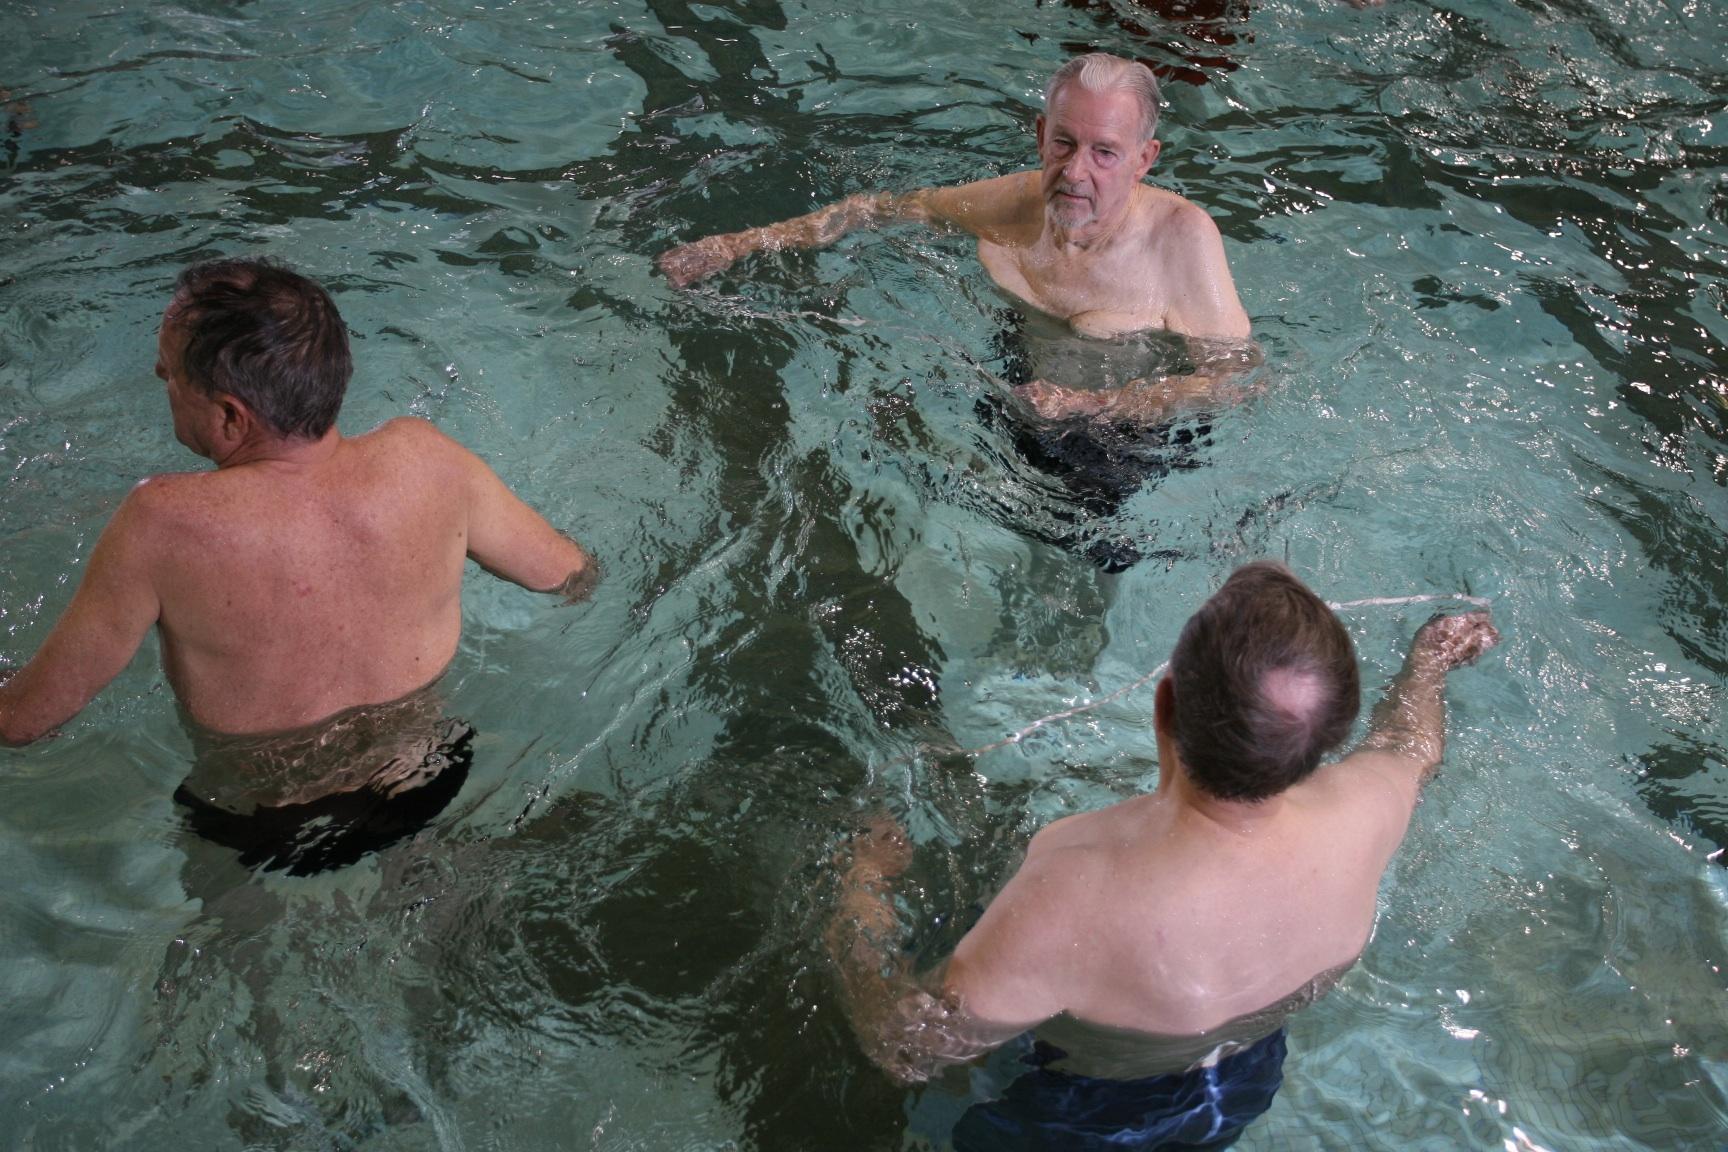 three men near each other in pool